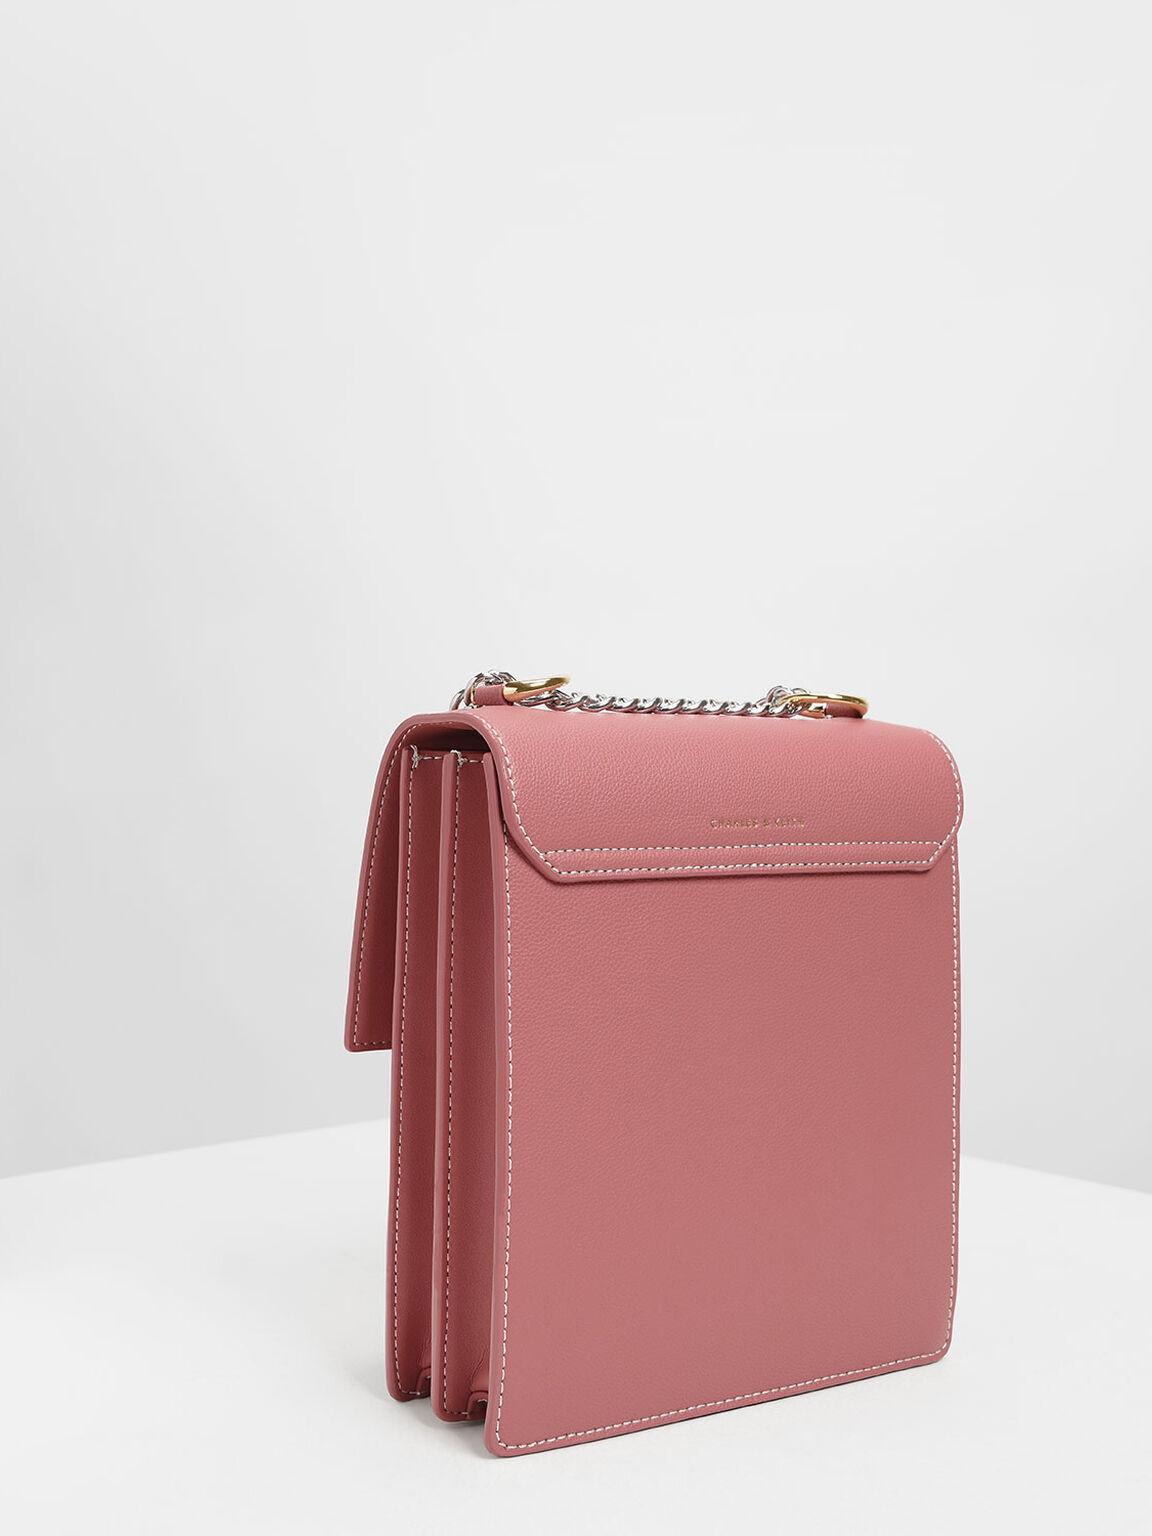 Chain Strap Portrait Messenger Bag, Pink, hi-res